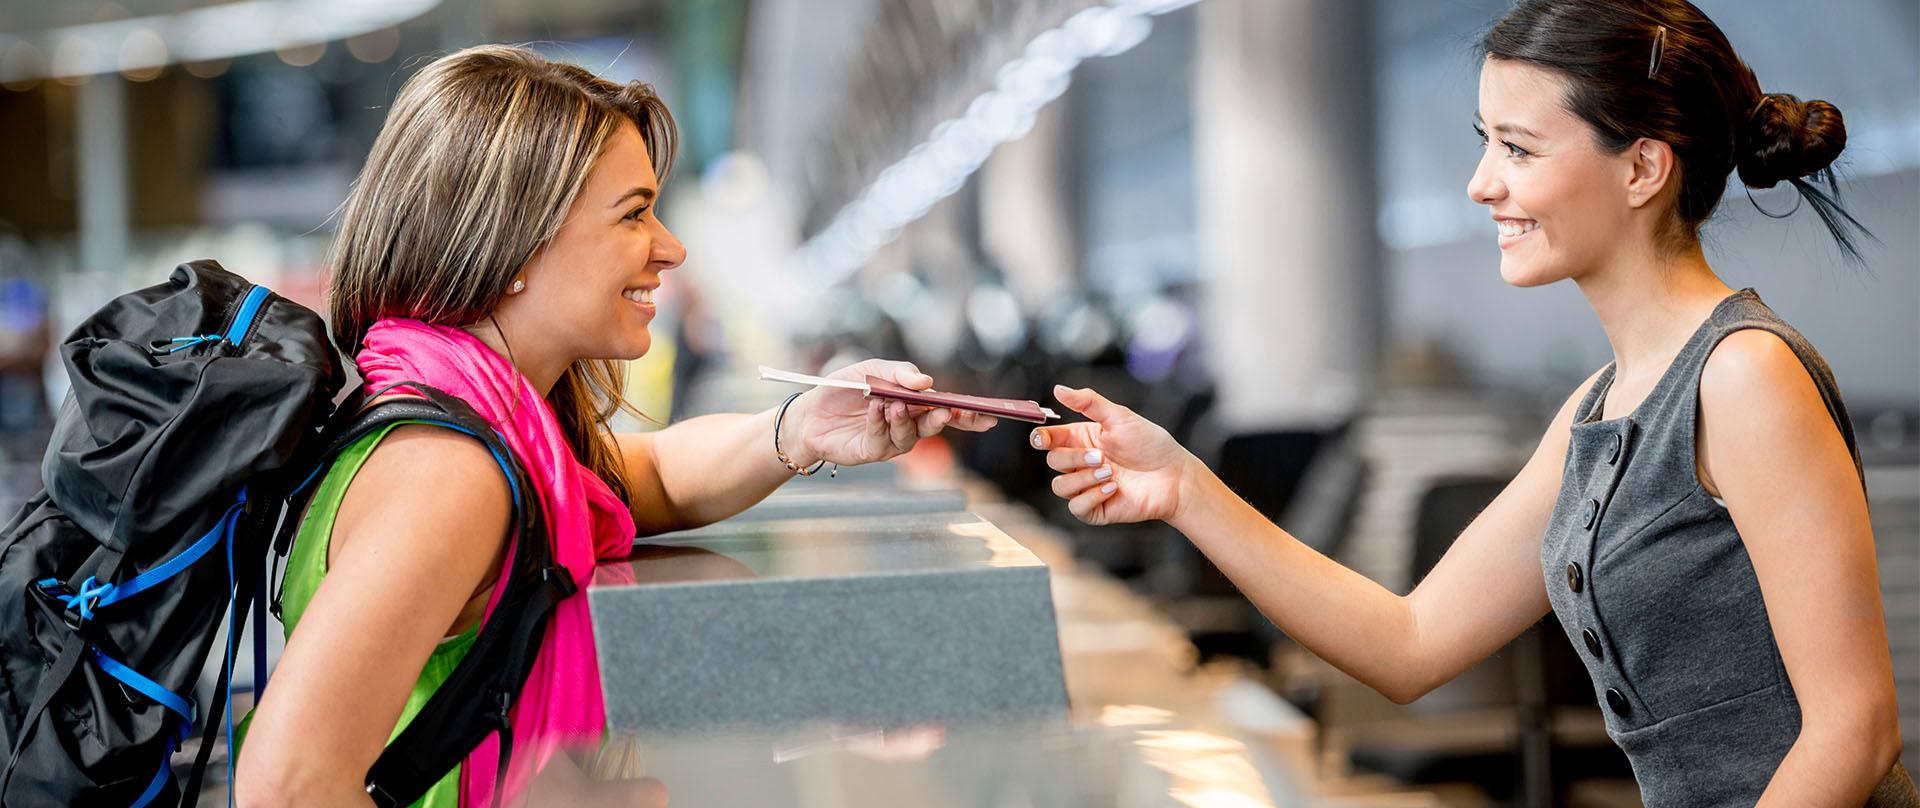 7 Customer Service Traits You Can't Teach